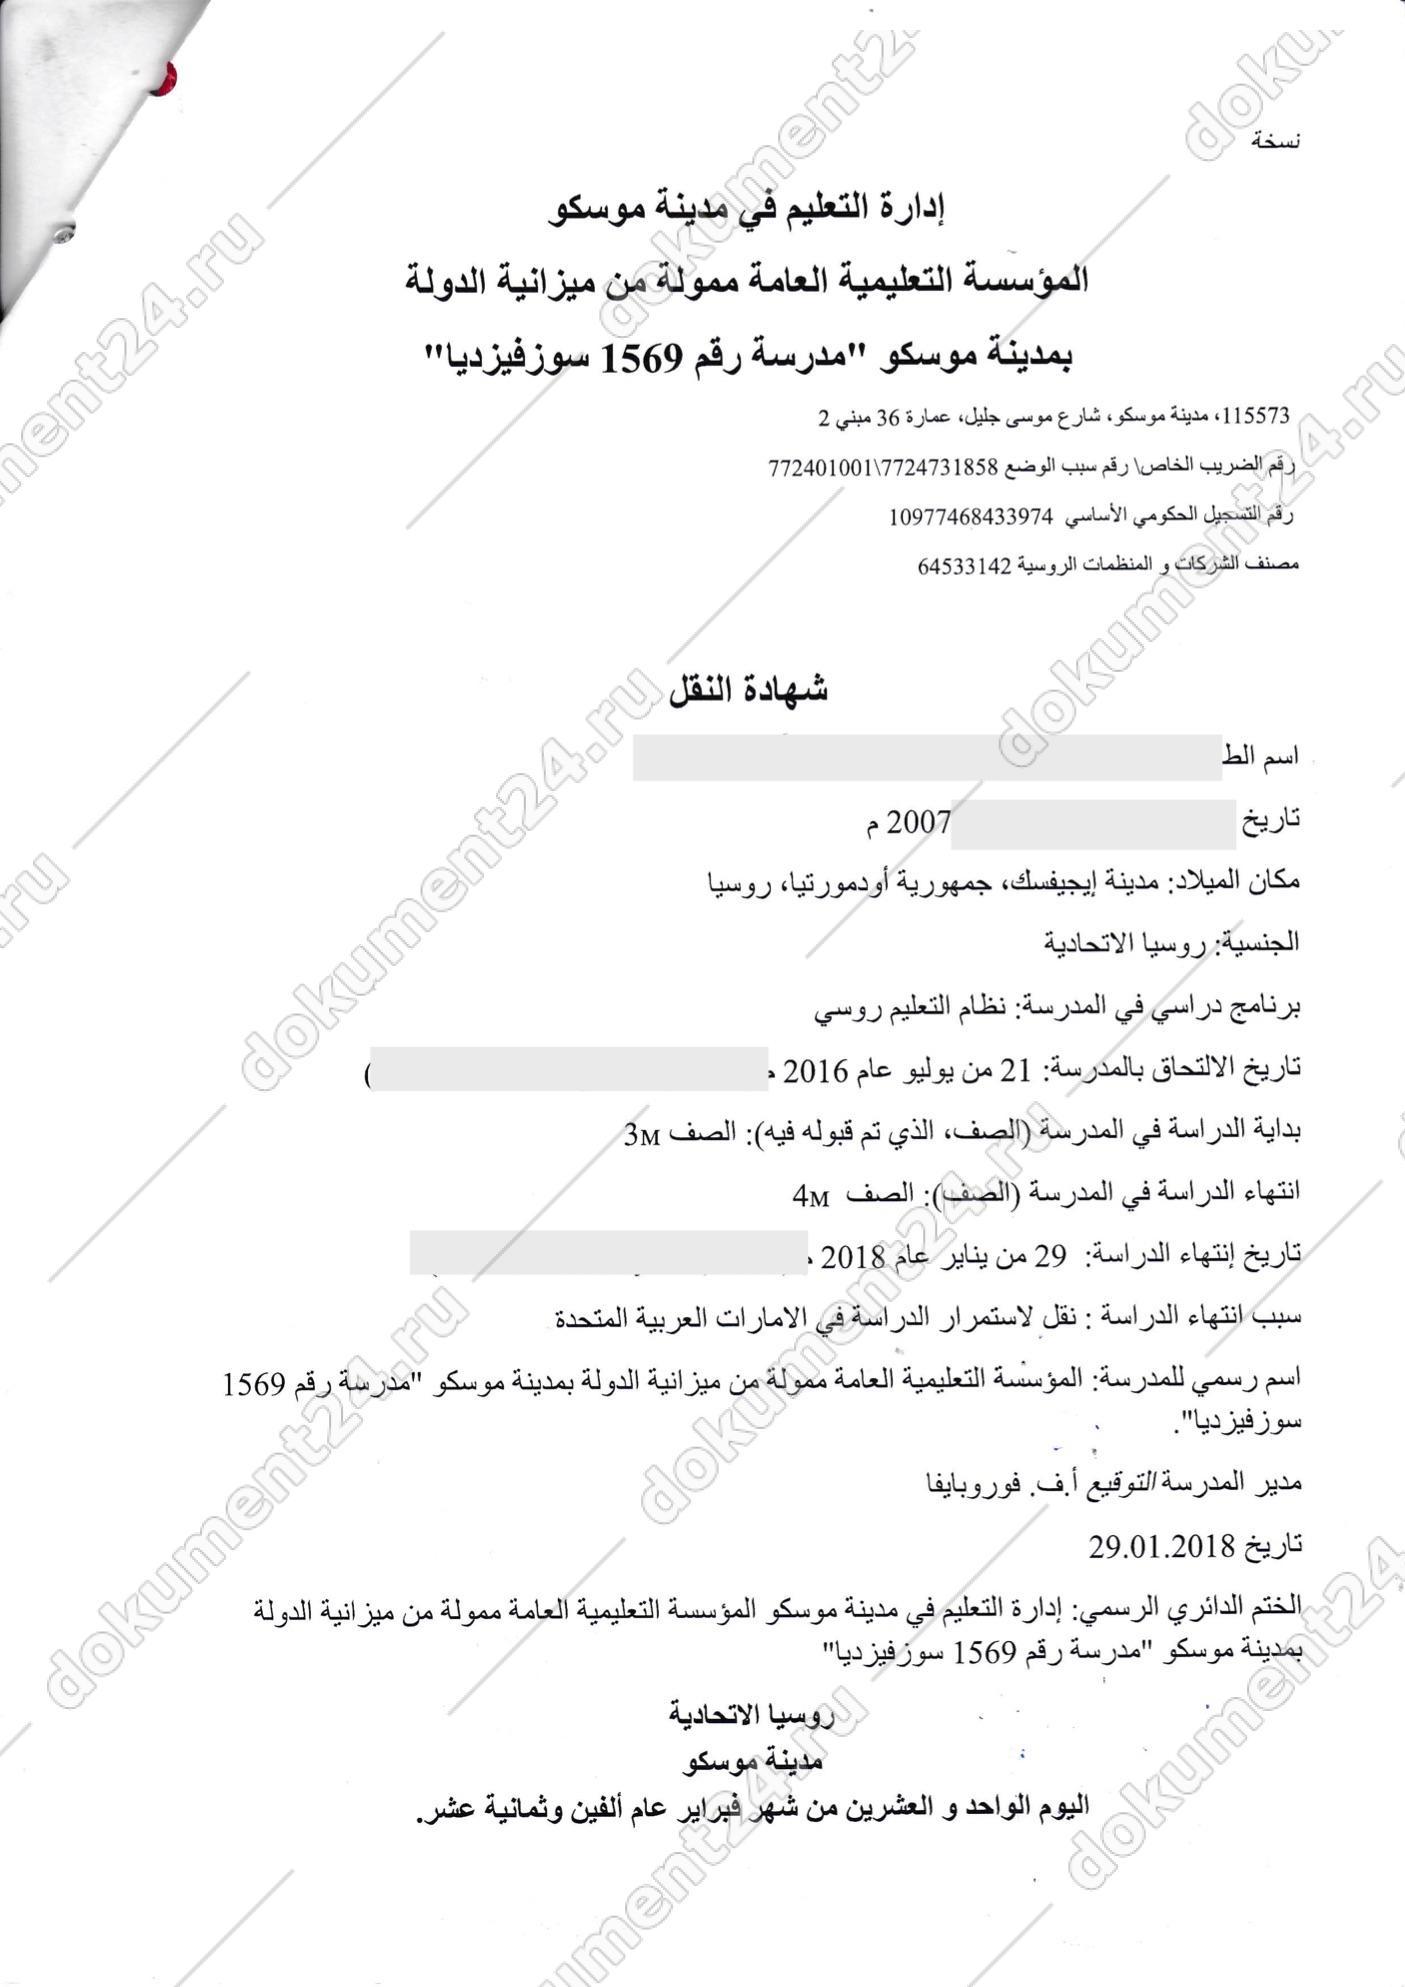 perevod perevodnogo sertifikata arabskii